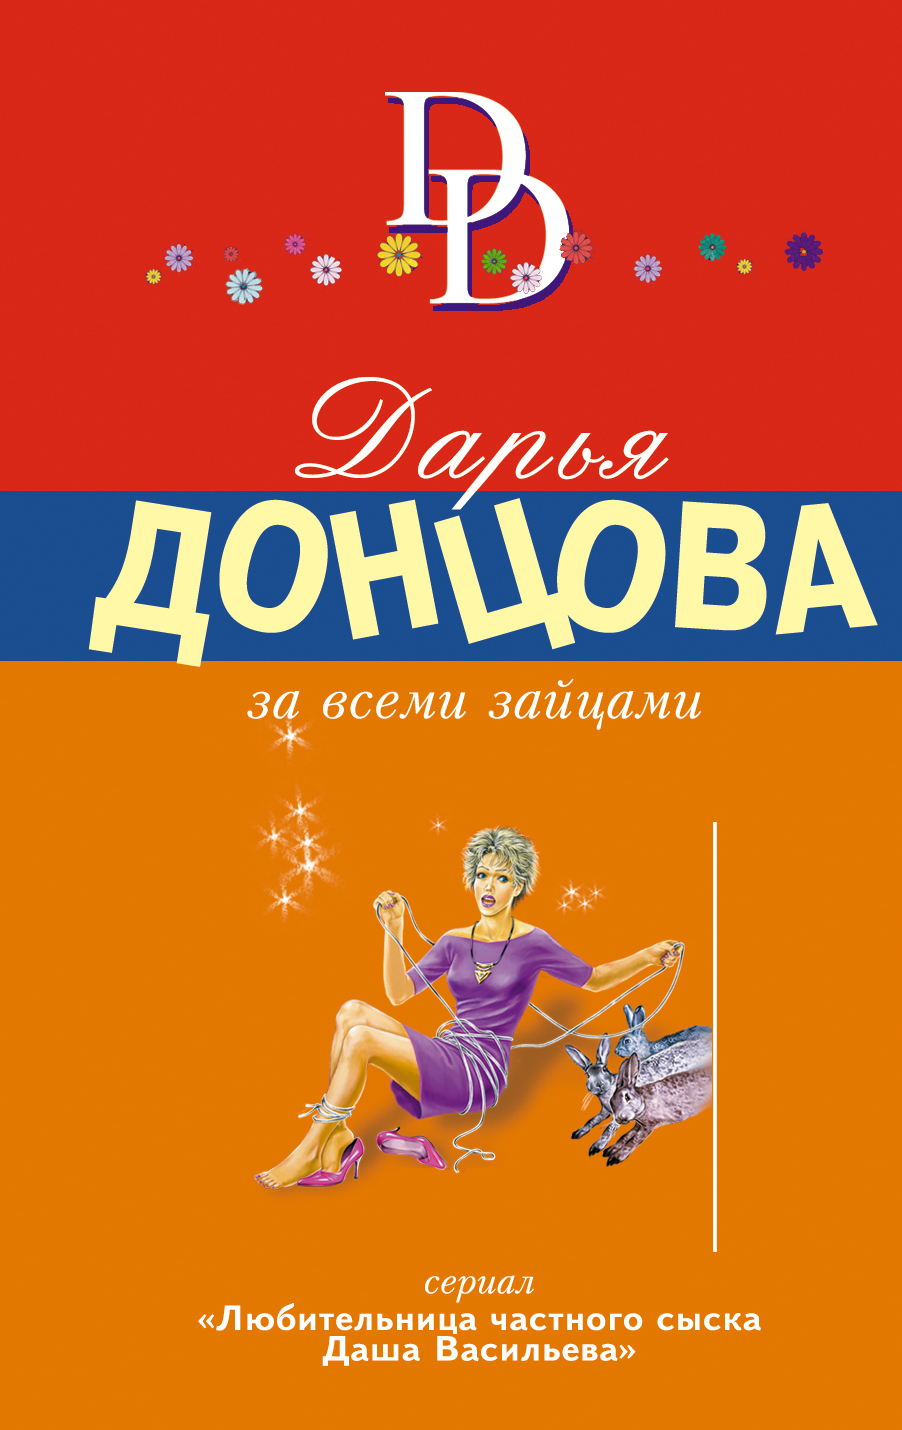 Дарья Донцова За всеми зайцами дарья донцова три мешка хитростей